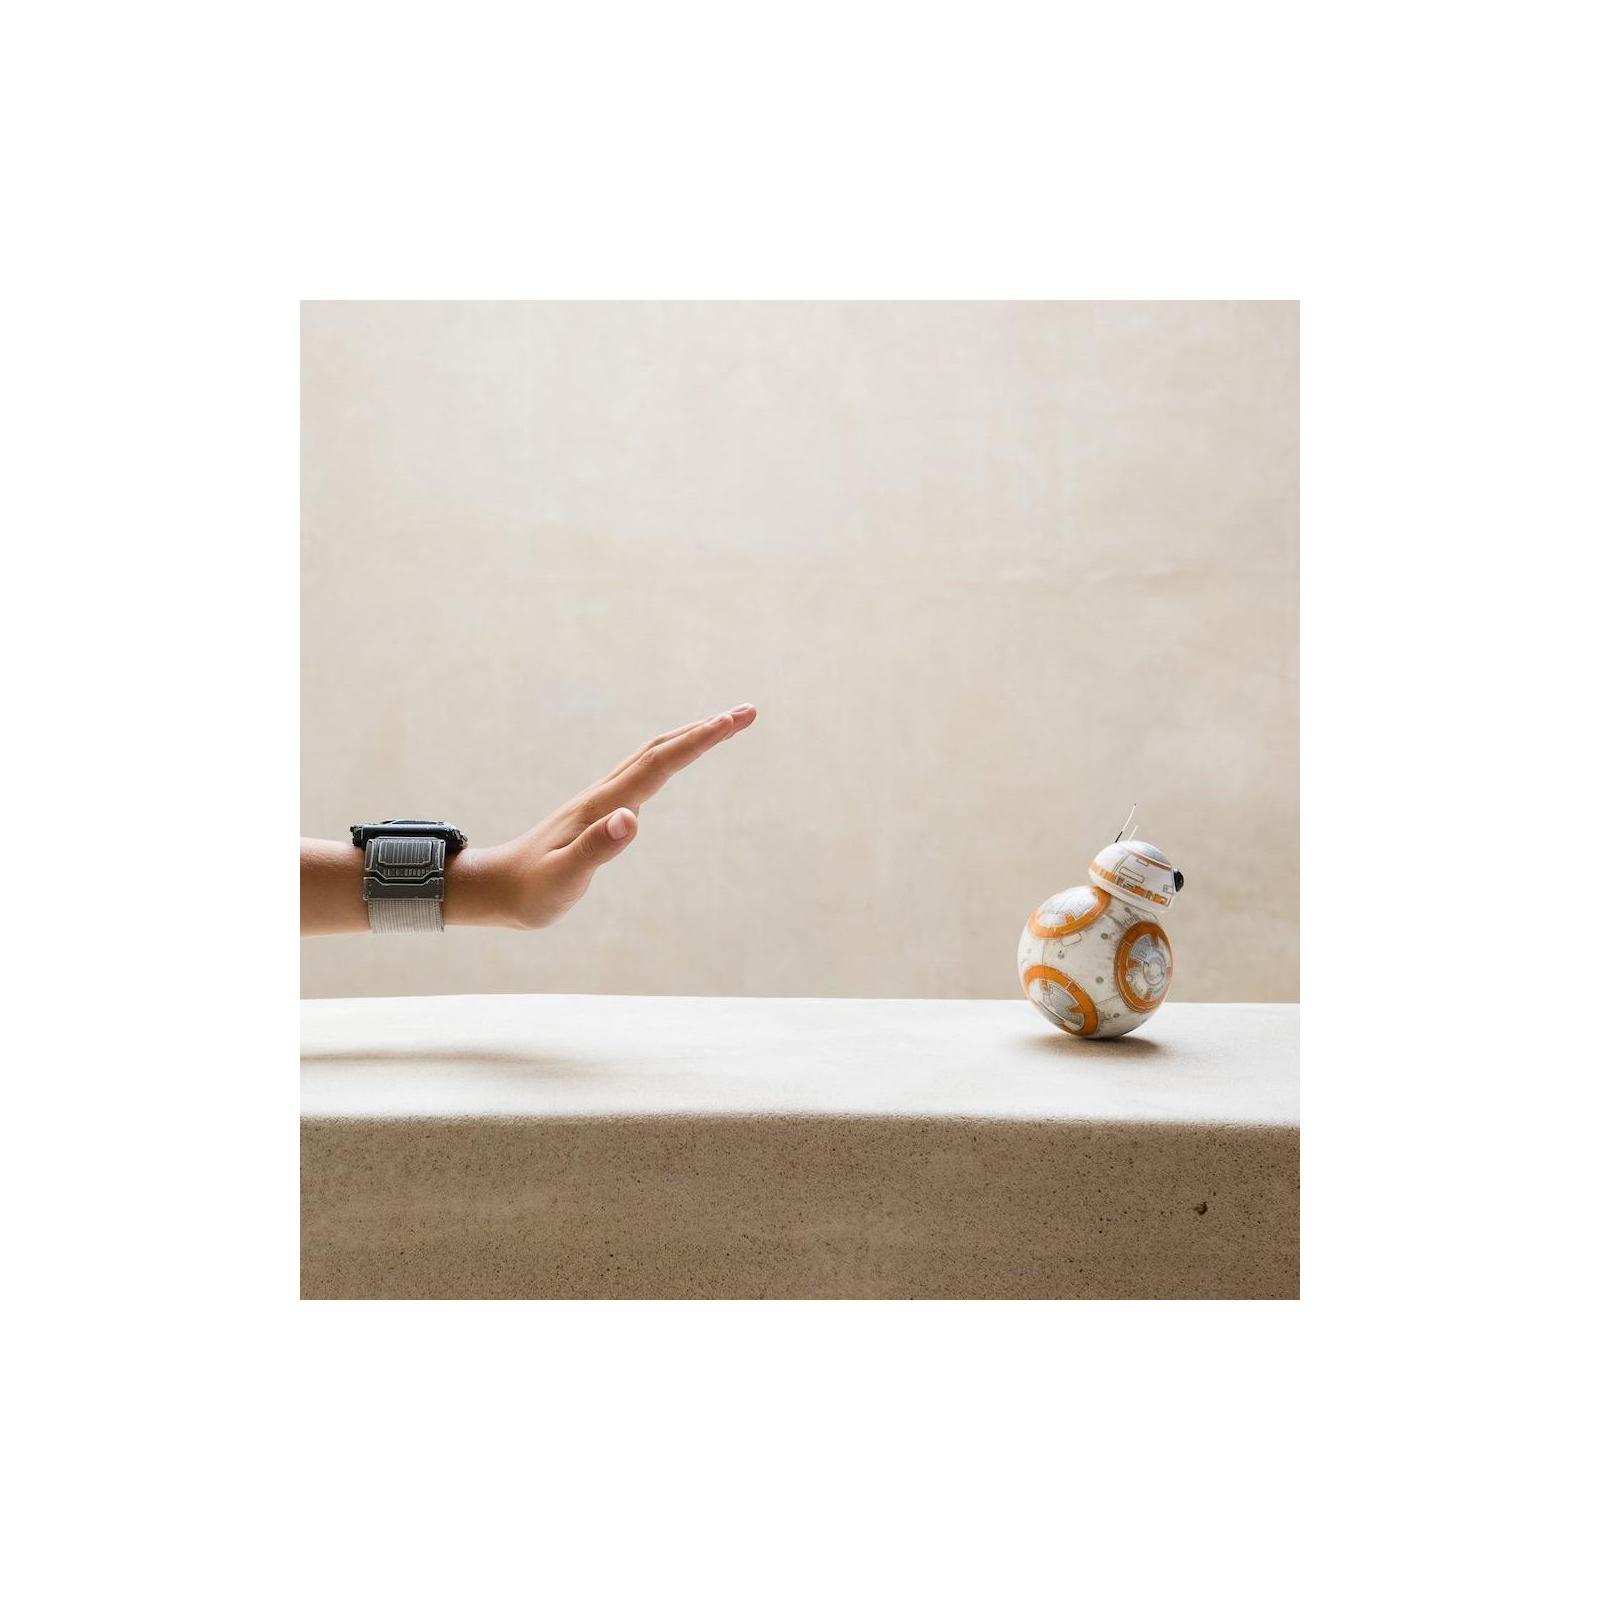 Робот Sphero BB-8 Special Edition with Force Band (322384) изображение 12